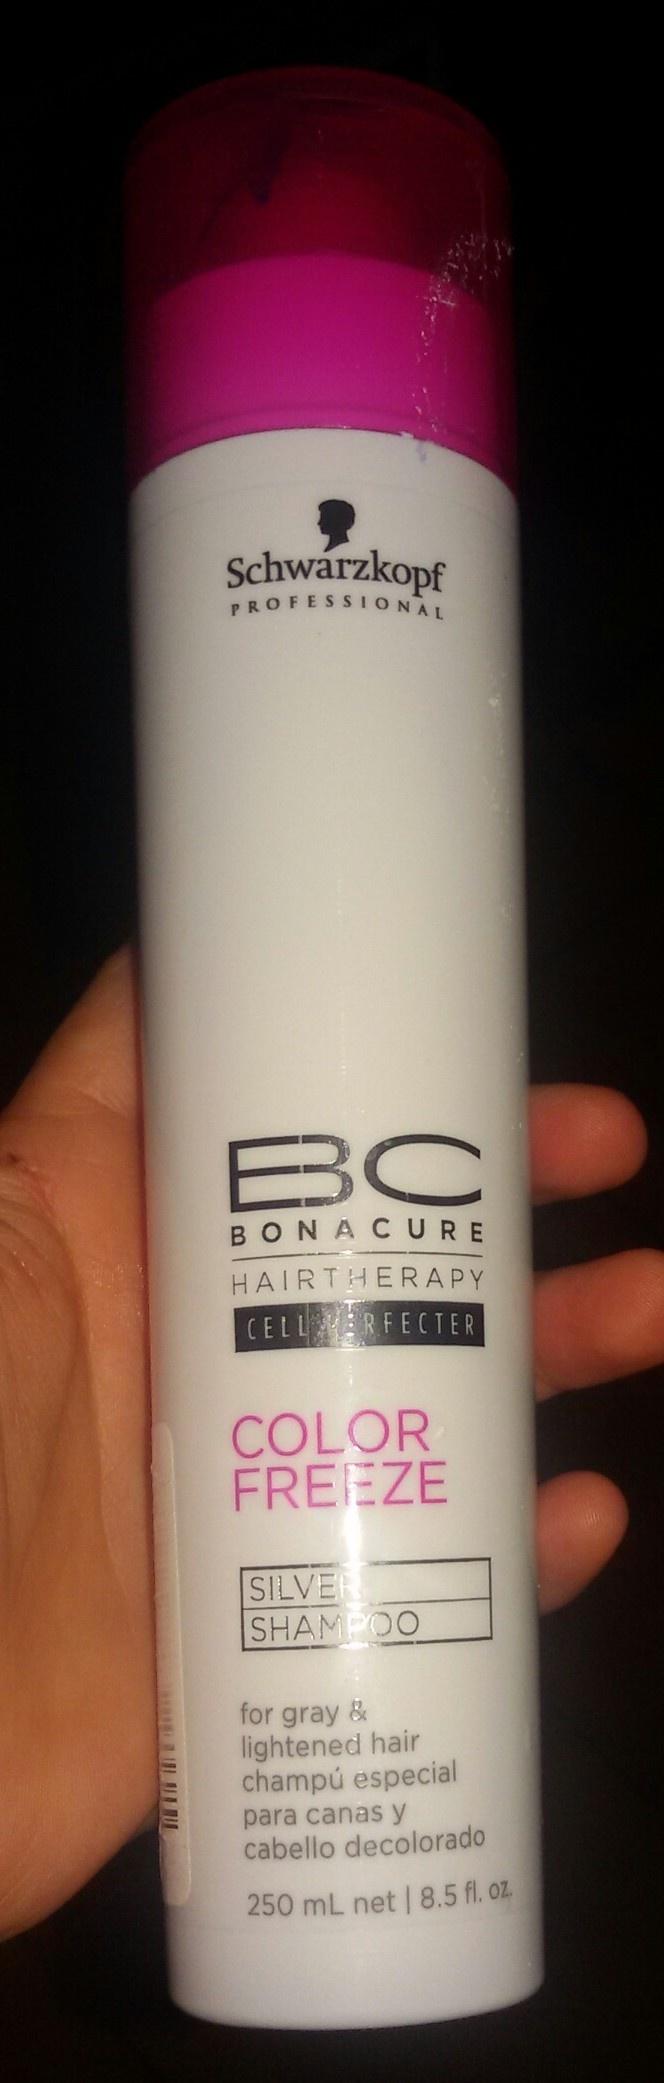 Silver Shampoo - BC Hairtherapy Color Freeze de Schwarzkopf Professional